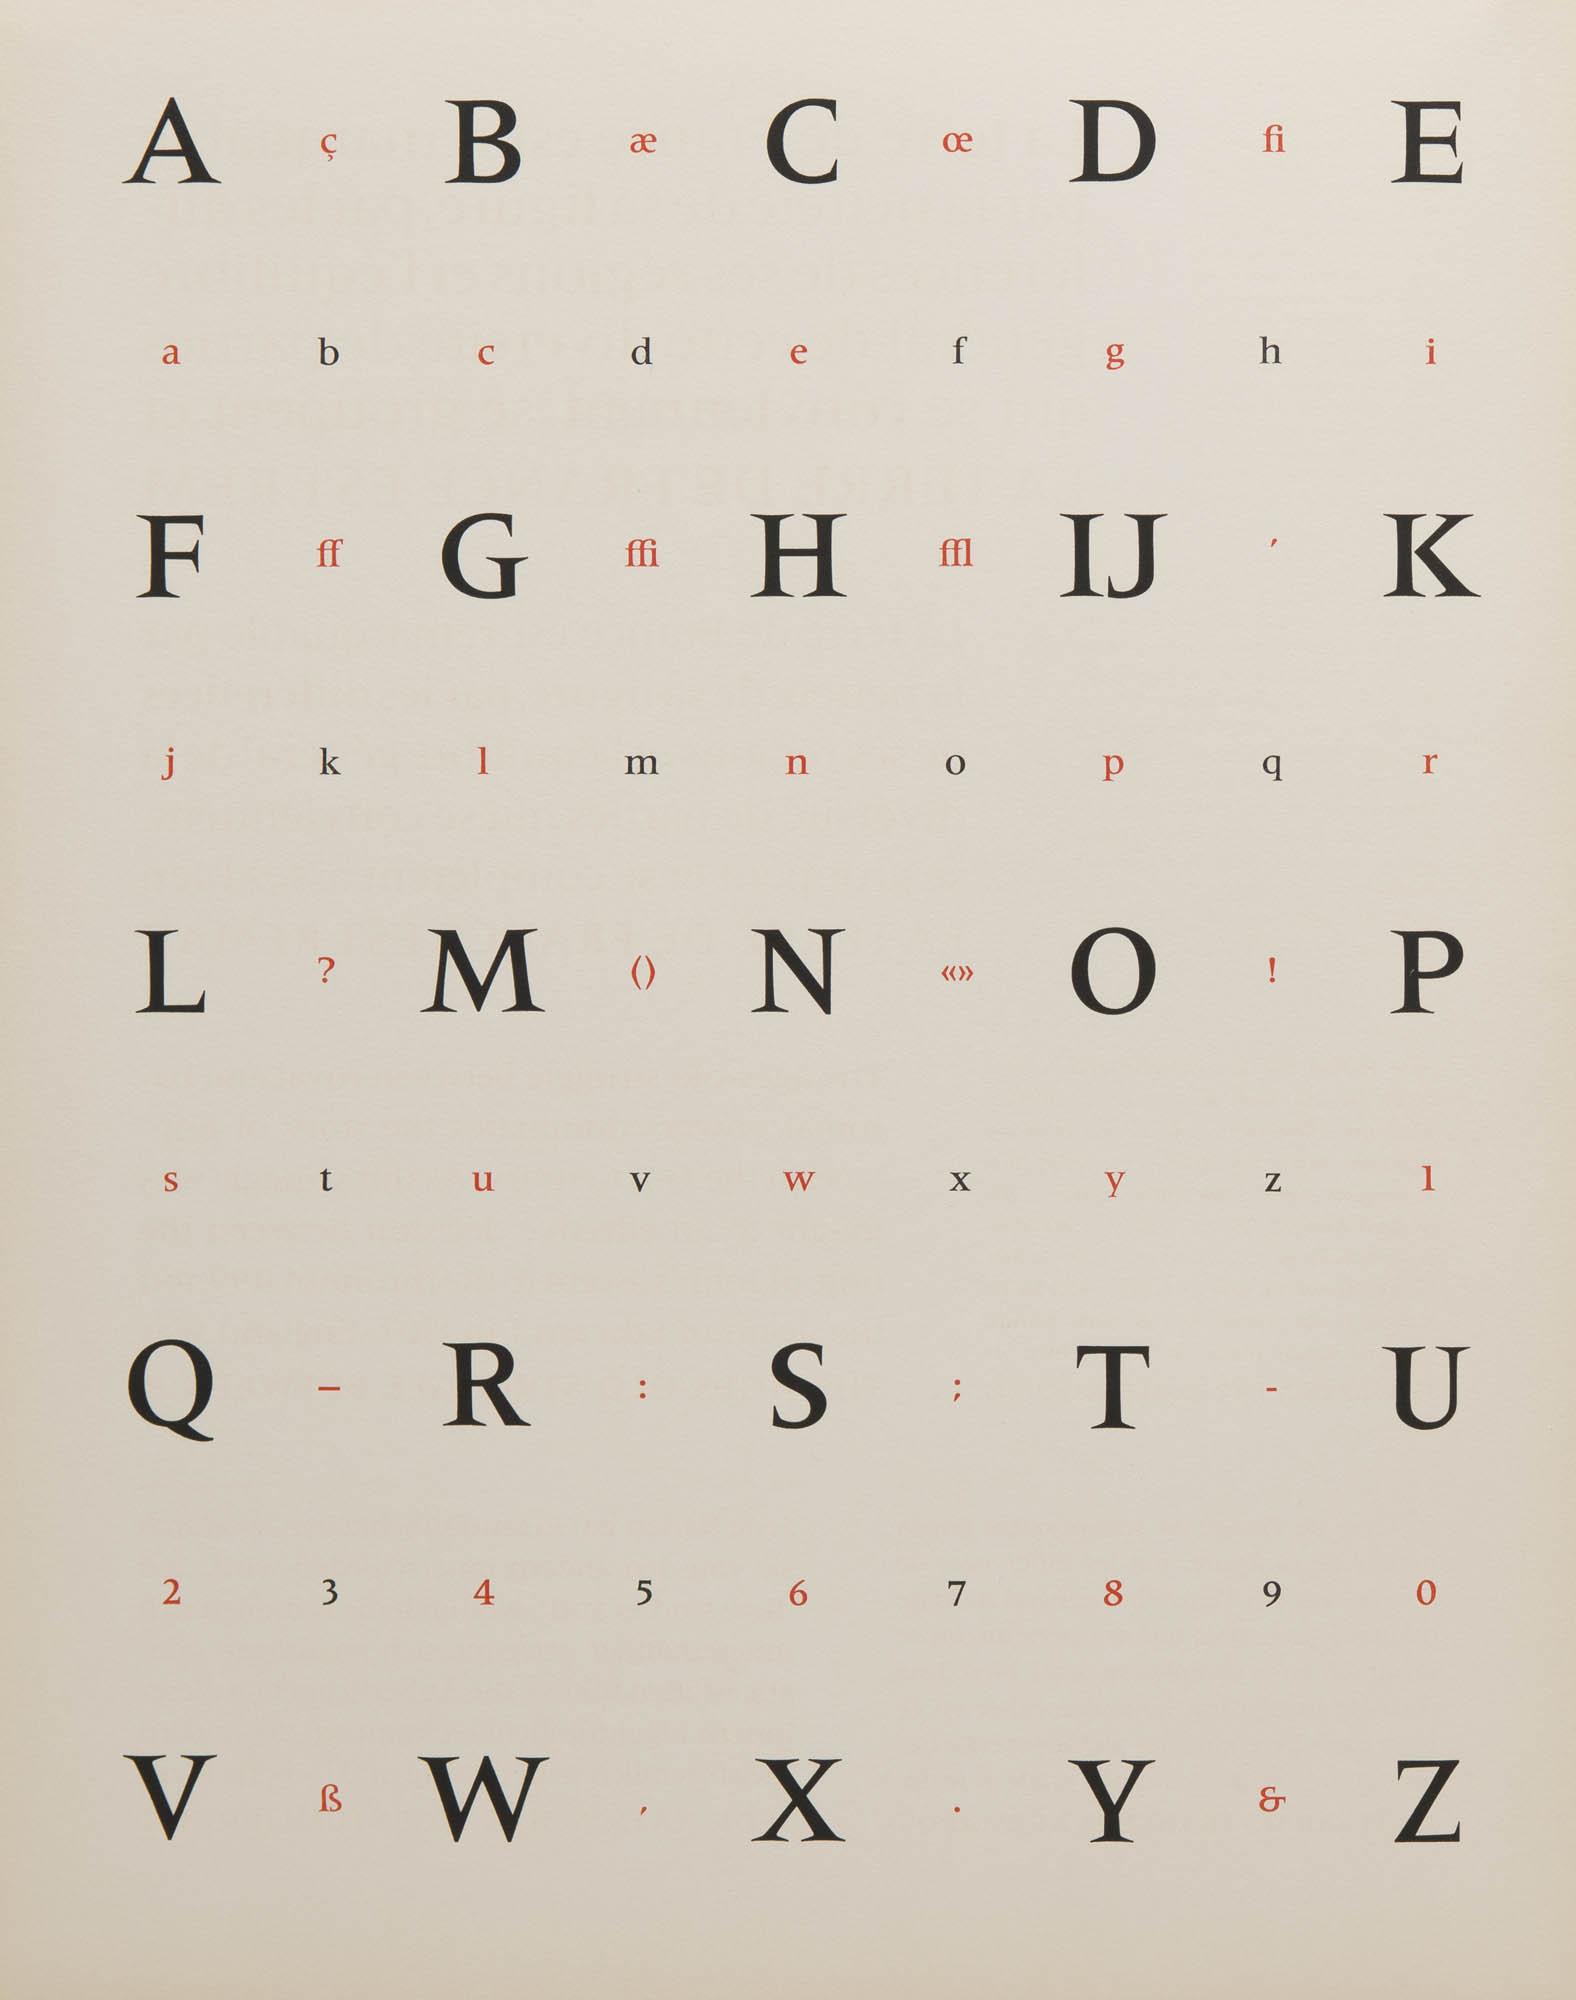 (Vorstudie zur Méridien), mintreoulphdafvbqswzxy Adrian Frutiger Dessin de caractères